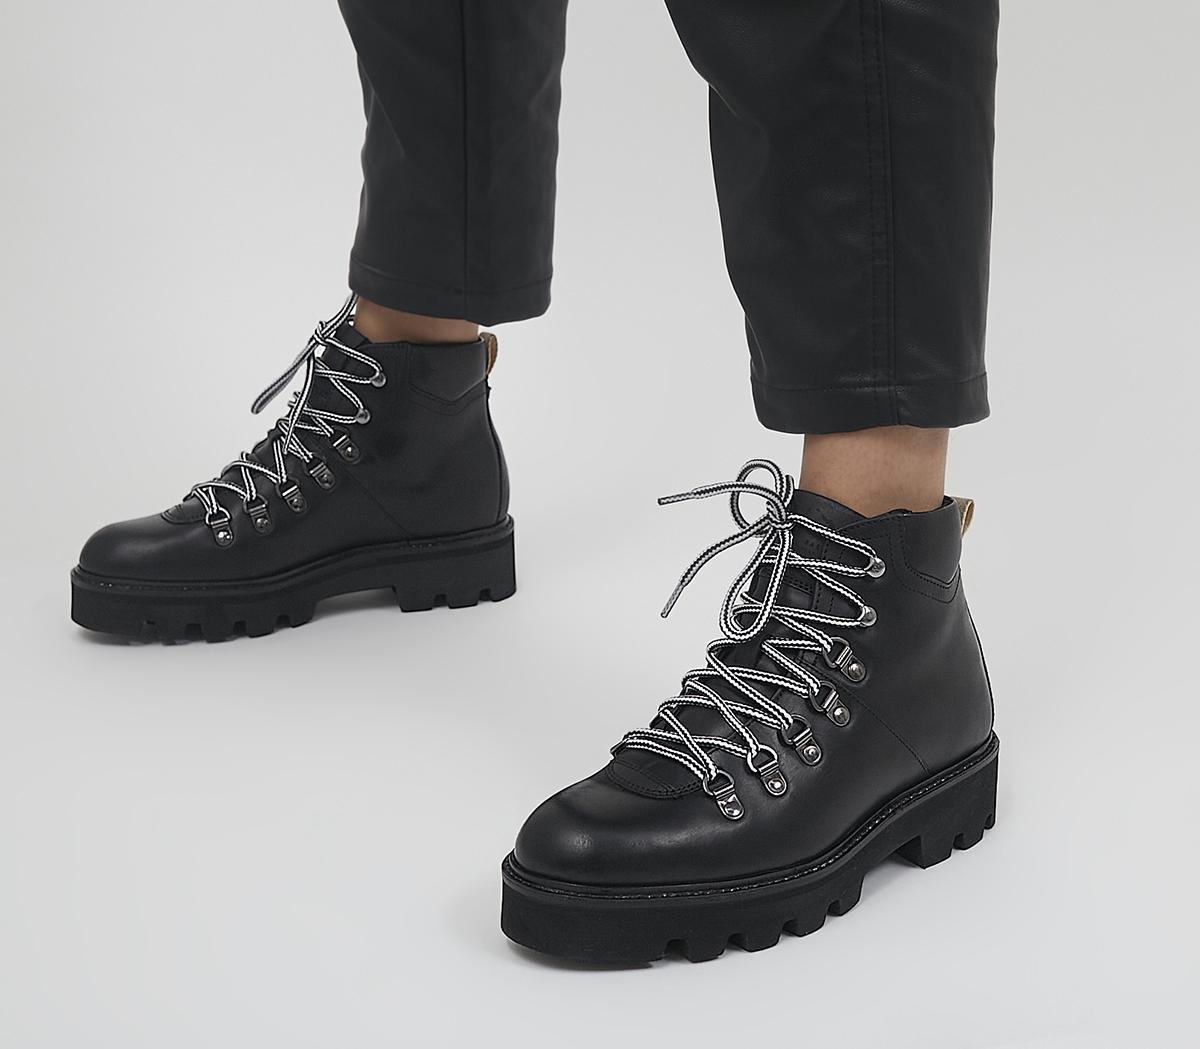 Ammella Hiker Boots